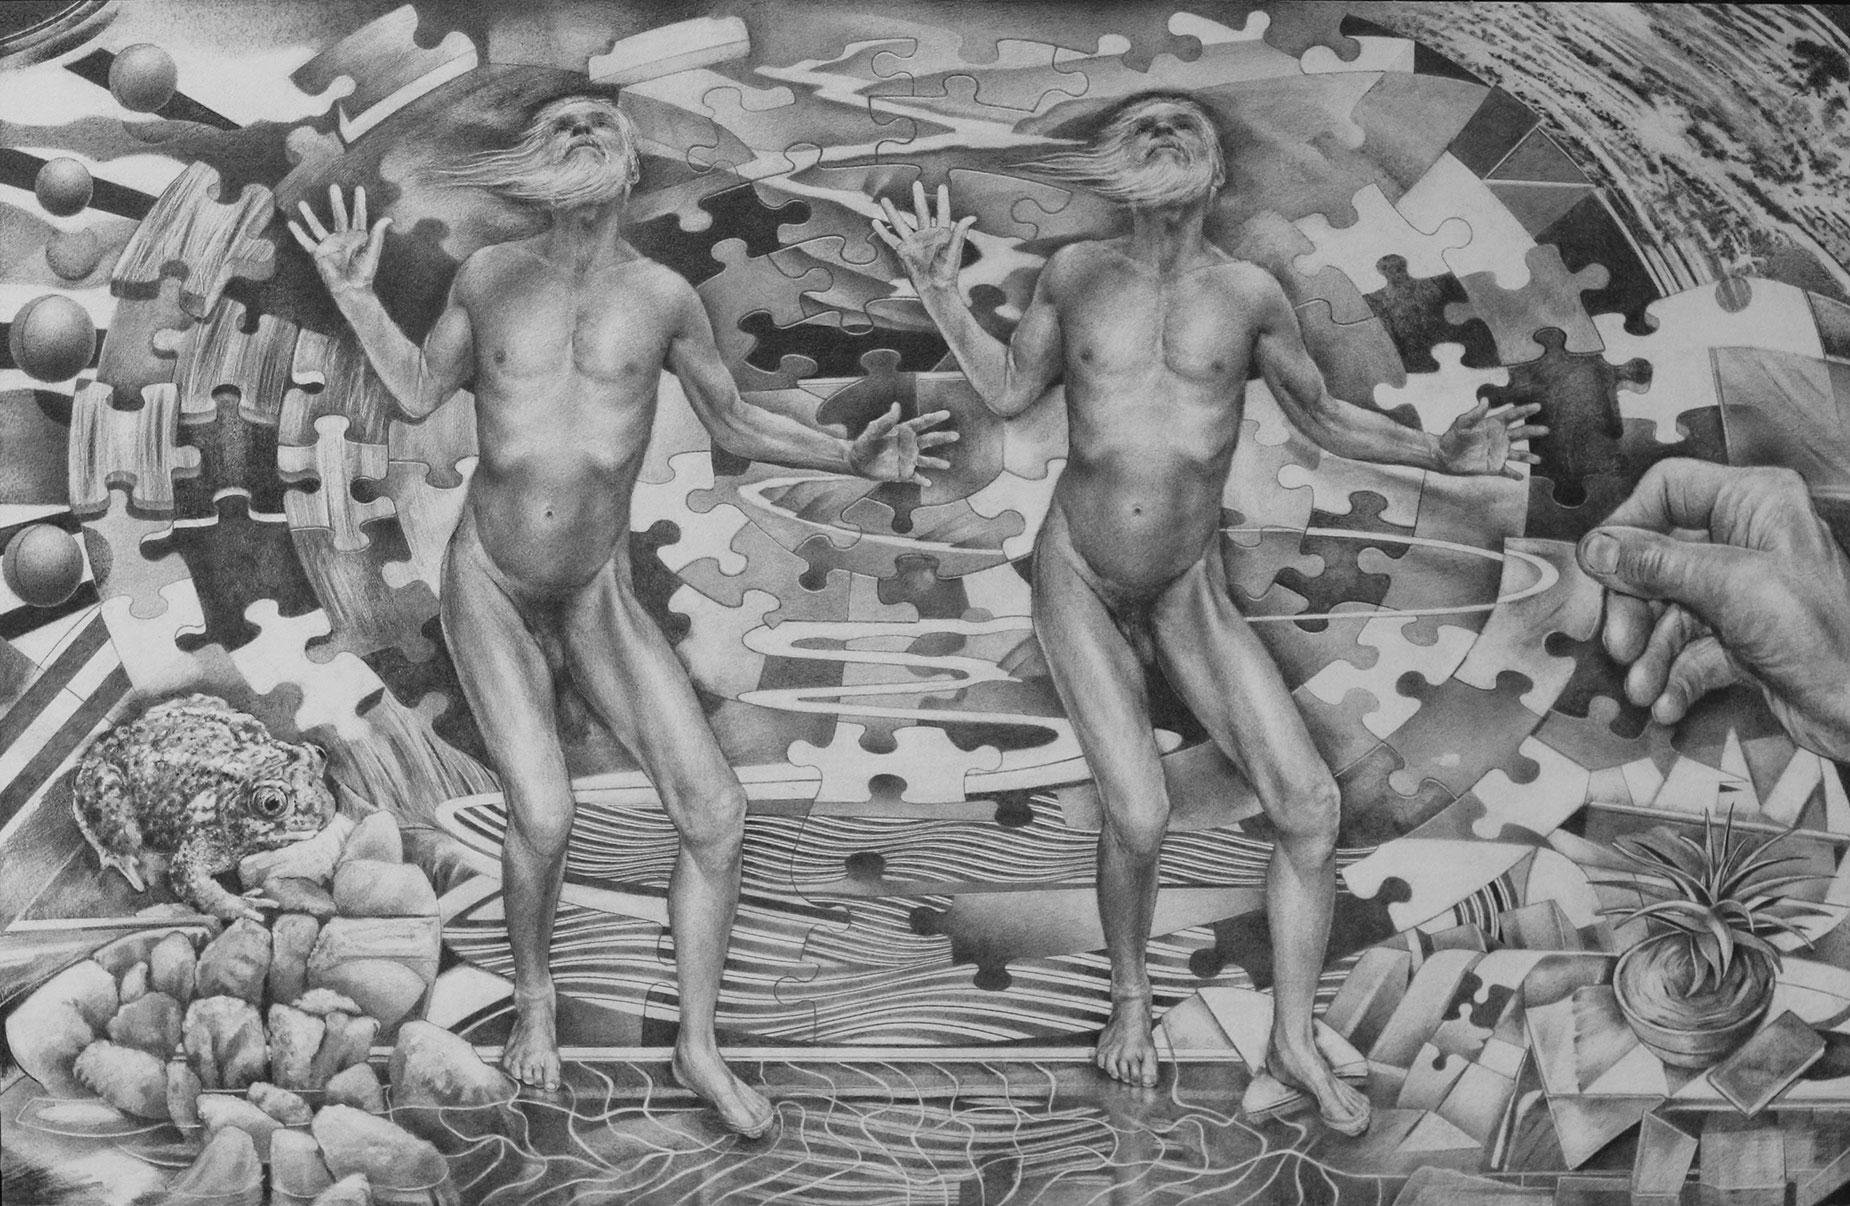 Stepping Large - Graphite Drawing by Richard Jacobi - The Mythologies